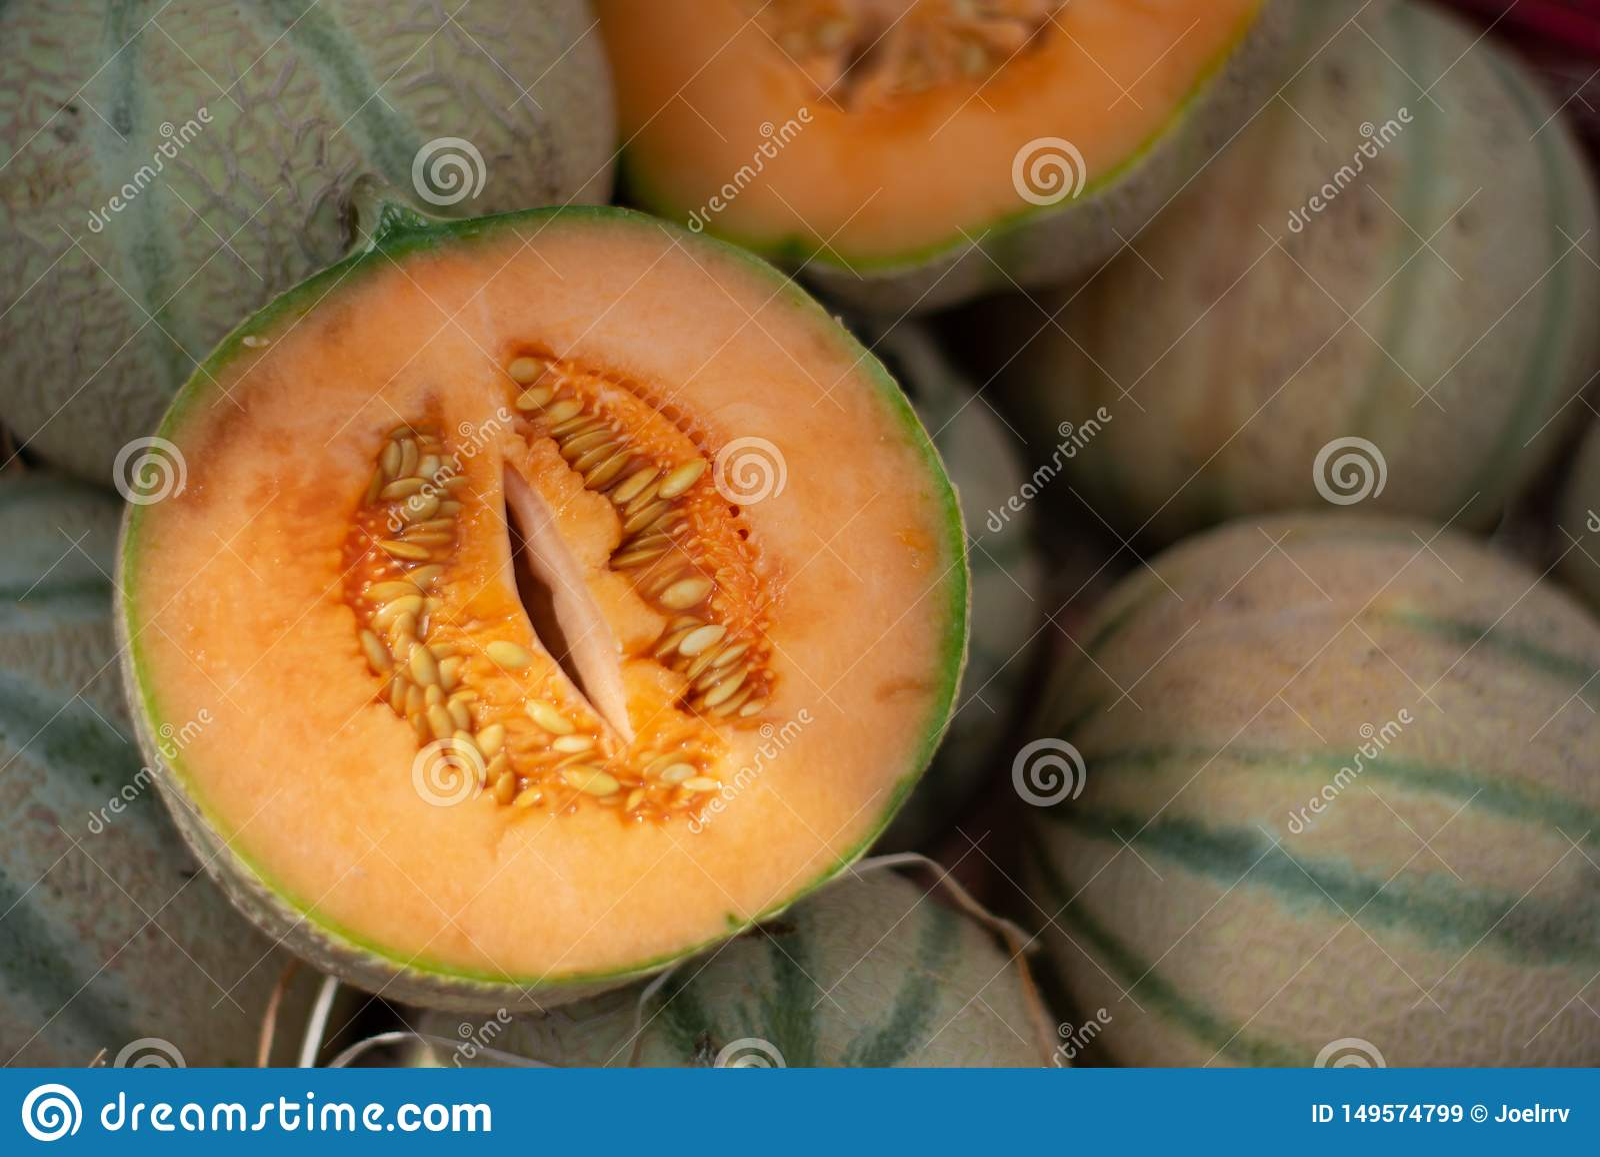 Öppen snittCharentais melon på marknadshögen